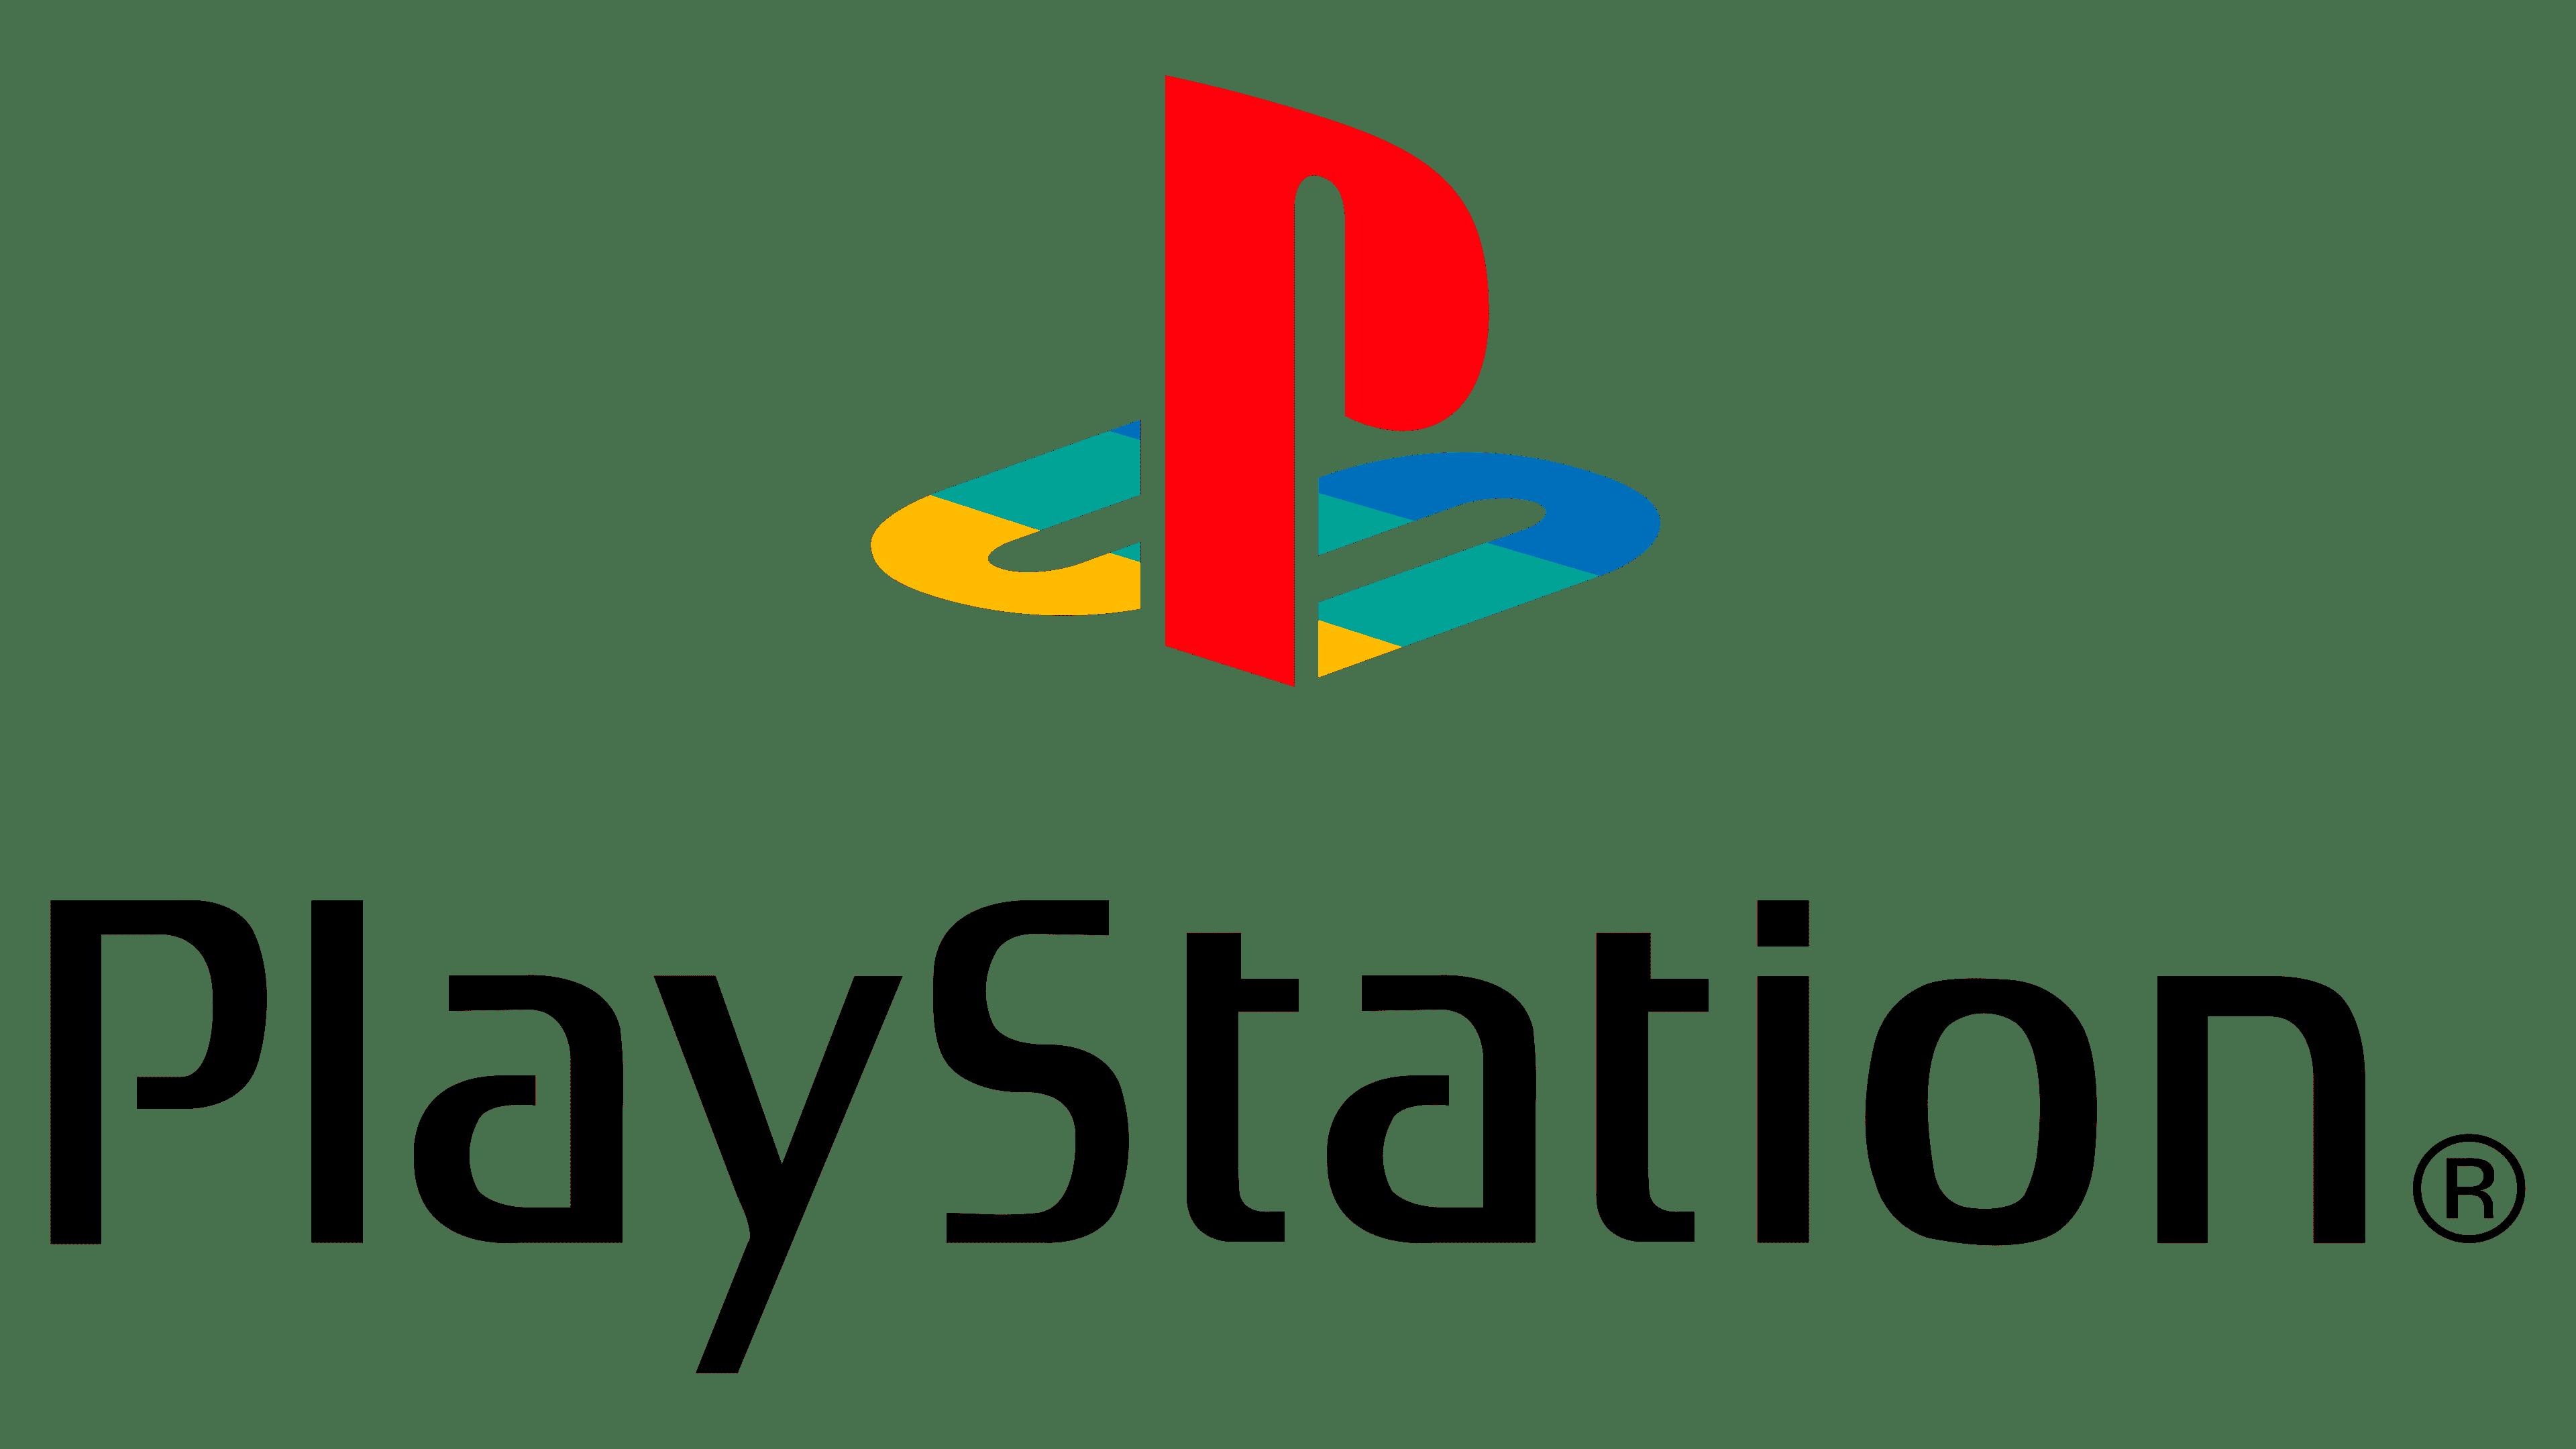 PlayStation emblem